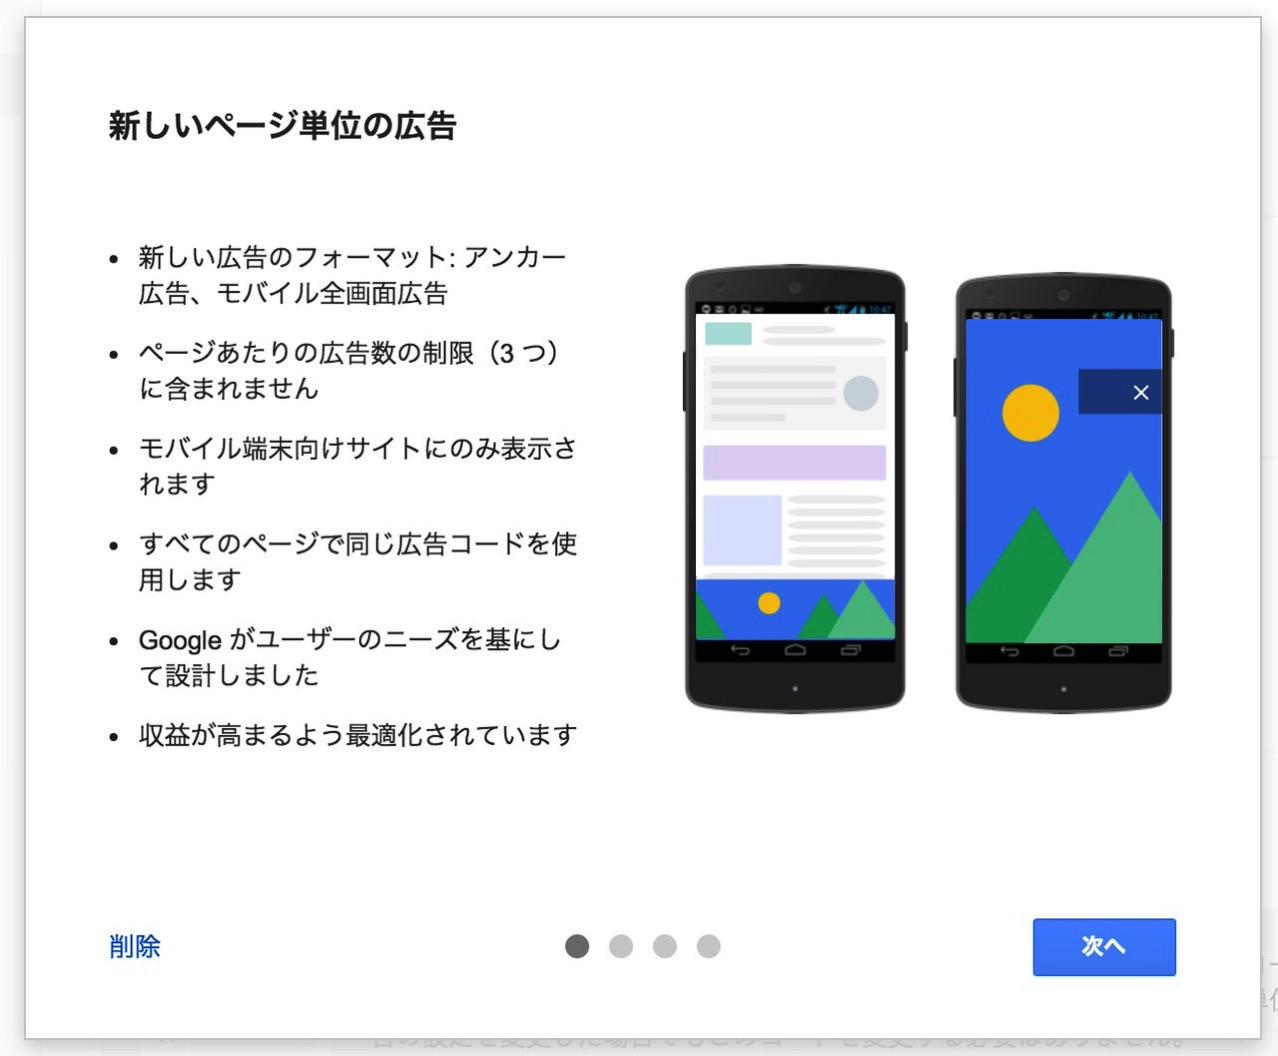 Google adsense 05 06 1346